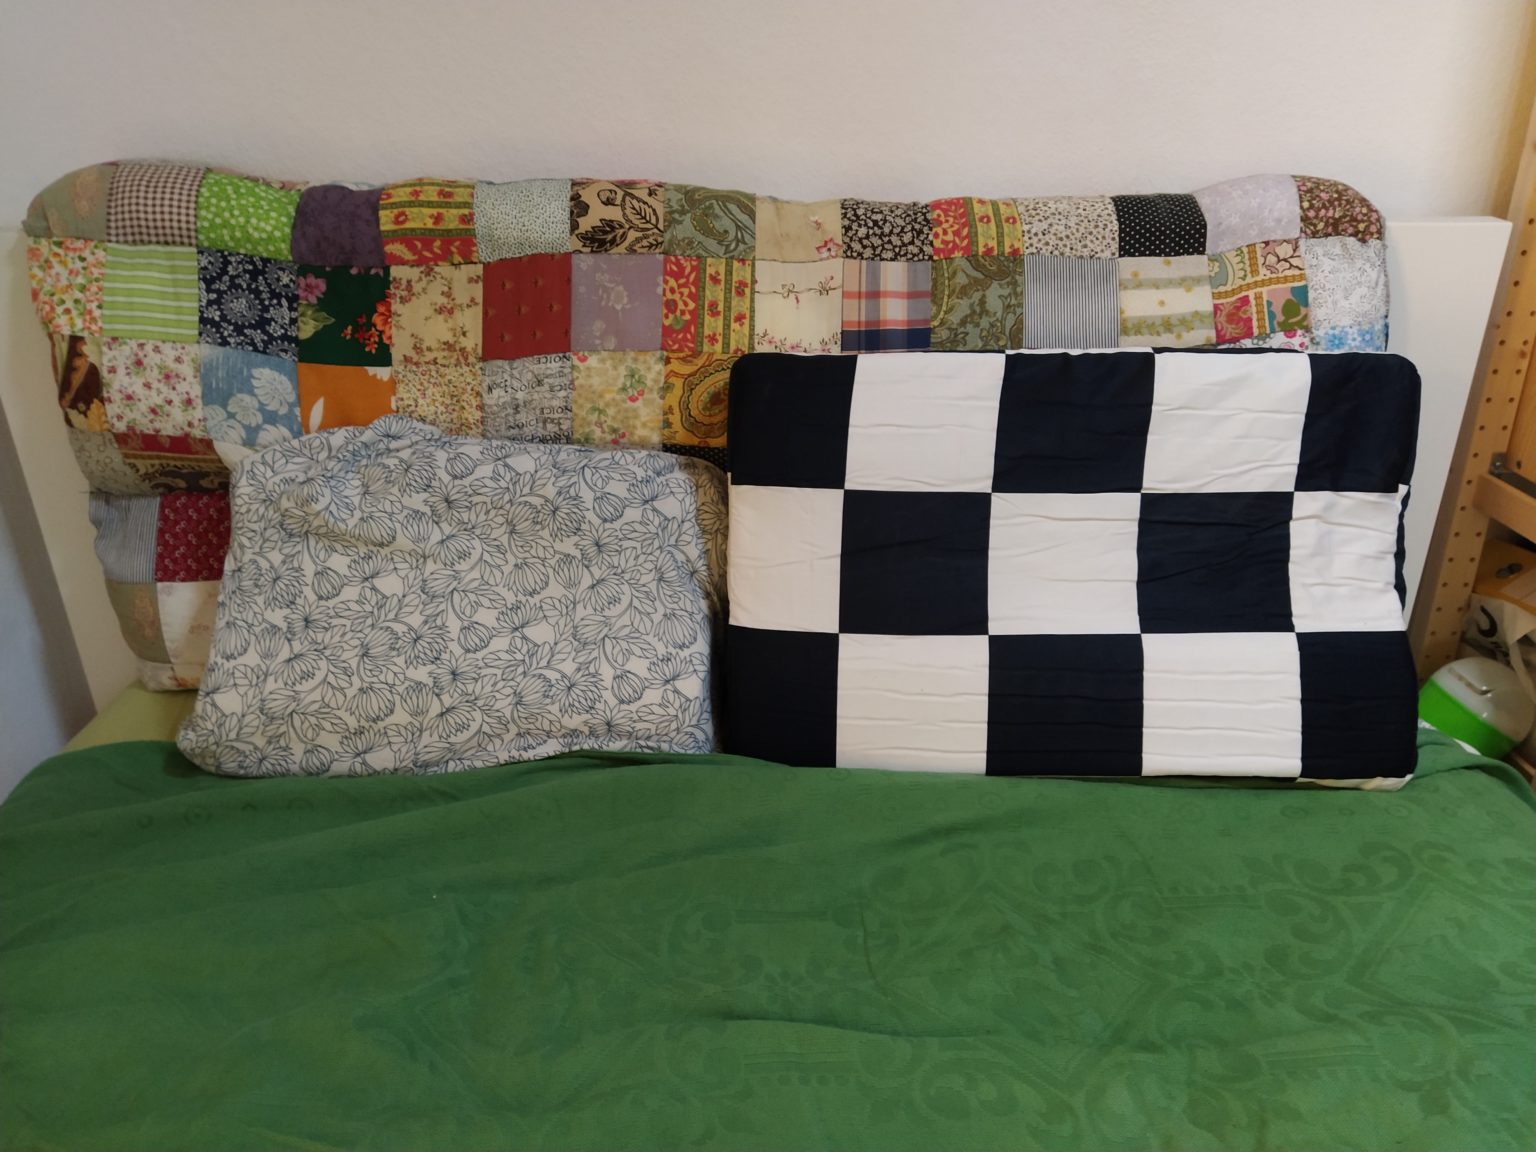 almohada viscoelastica modular de U2 junto a mi almohada vieja